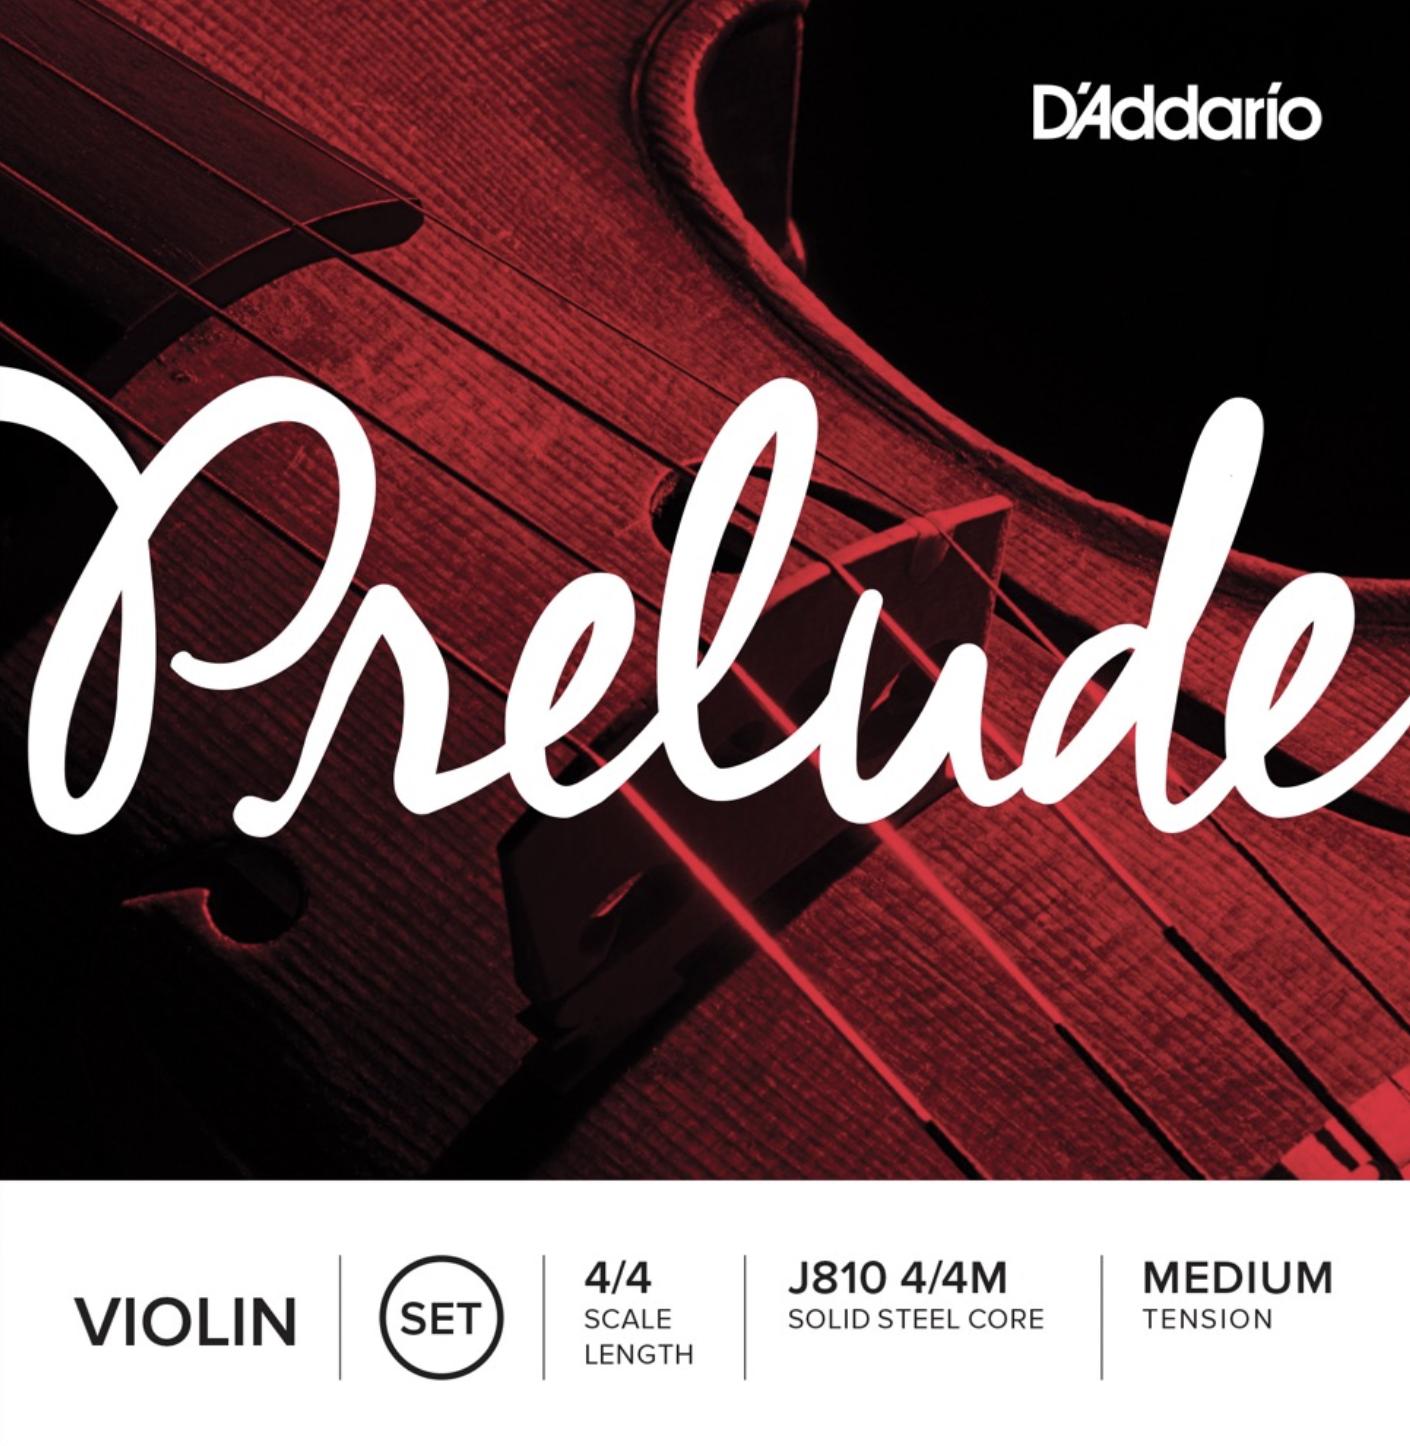 D'Addario Prelude J810 4/4M strengesett for fiolin 4/4 Medium Tension